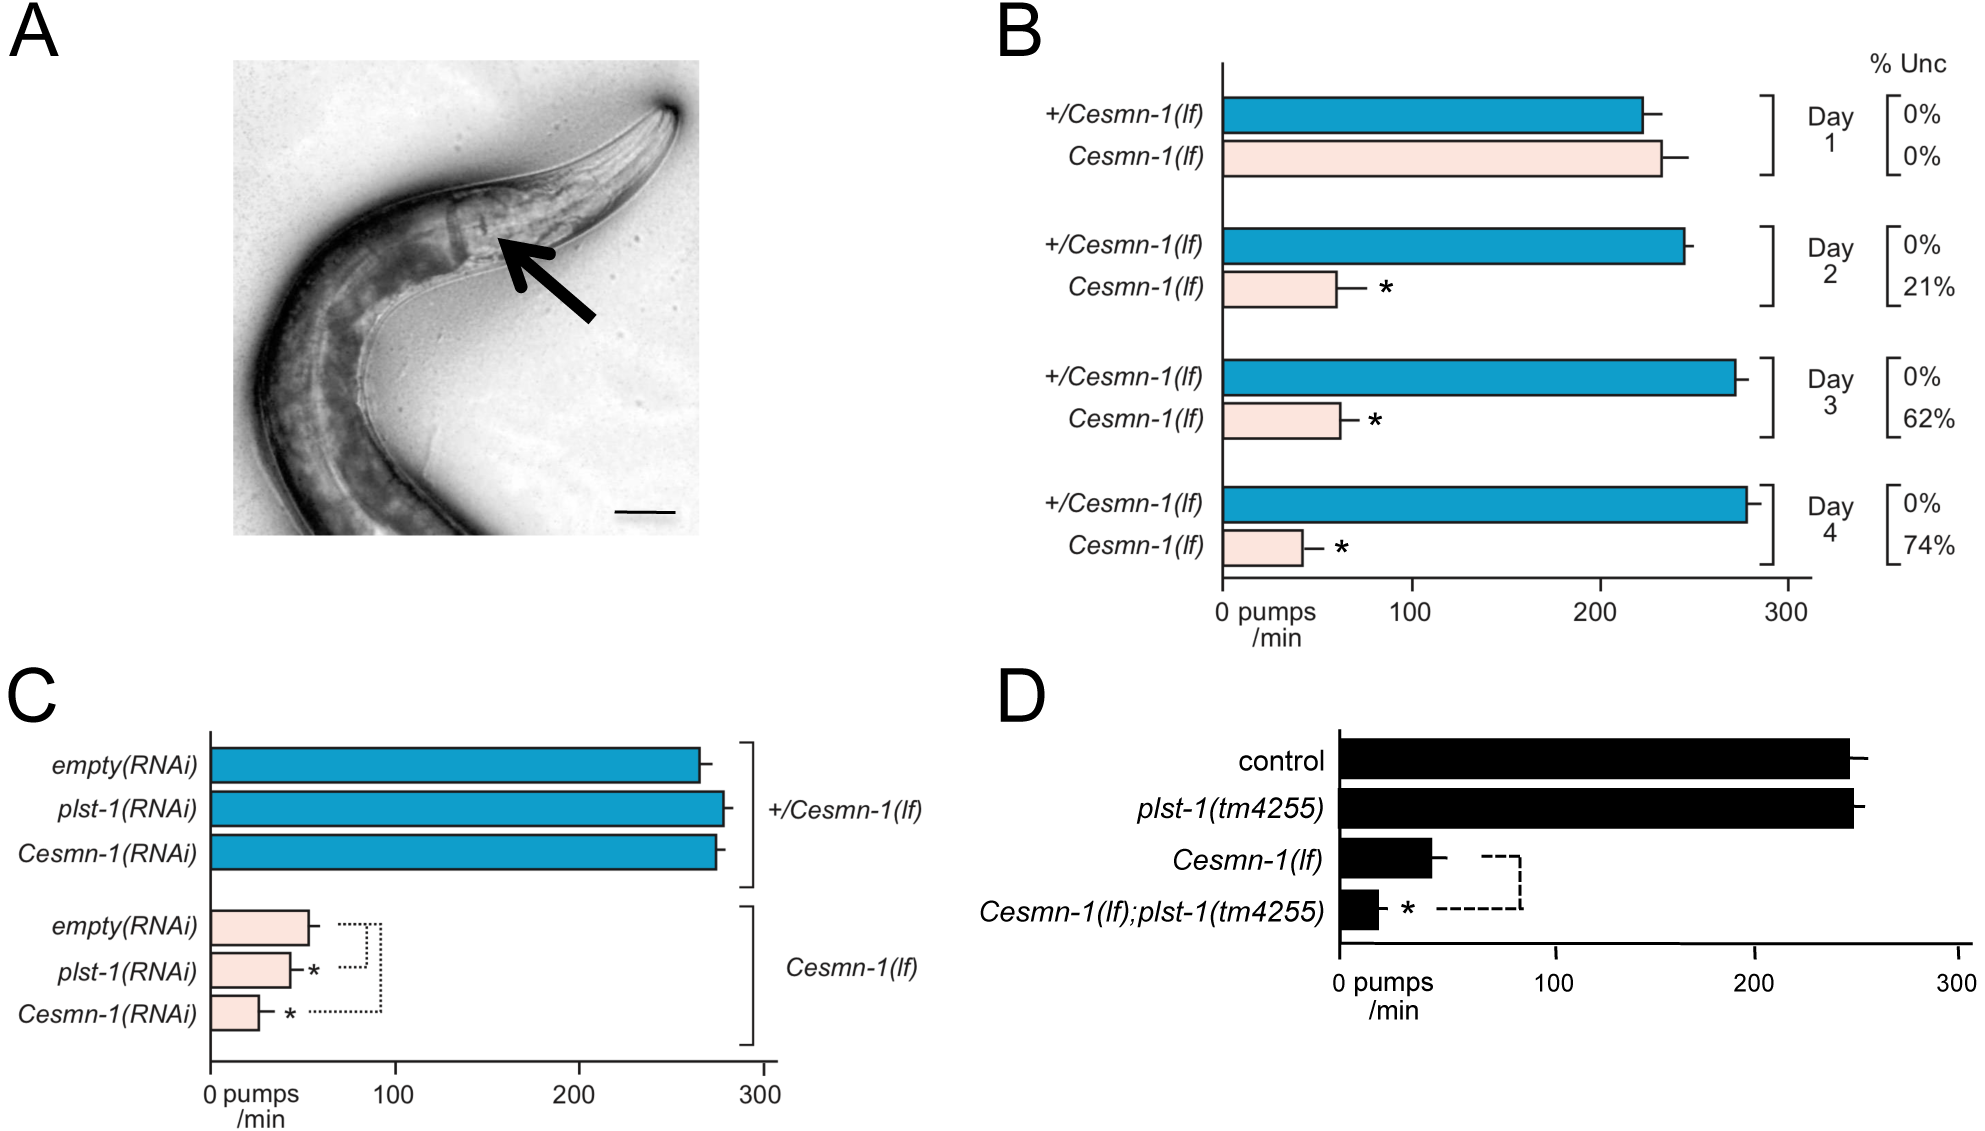 Loss of <i>C. elegans</i> PLS3 ortholog enhances the pharyngeal pumping defects of <i>Cesmn-1(lf)</i> animals.